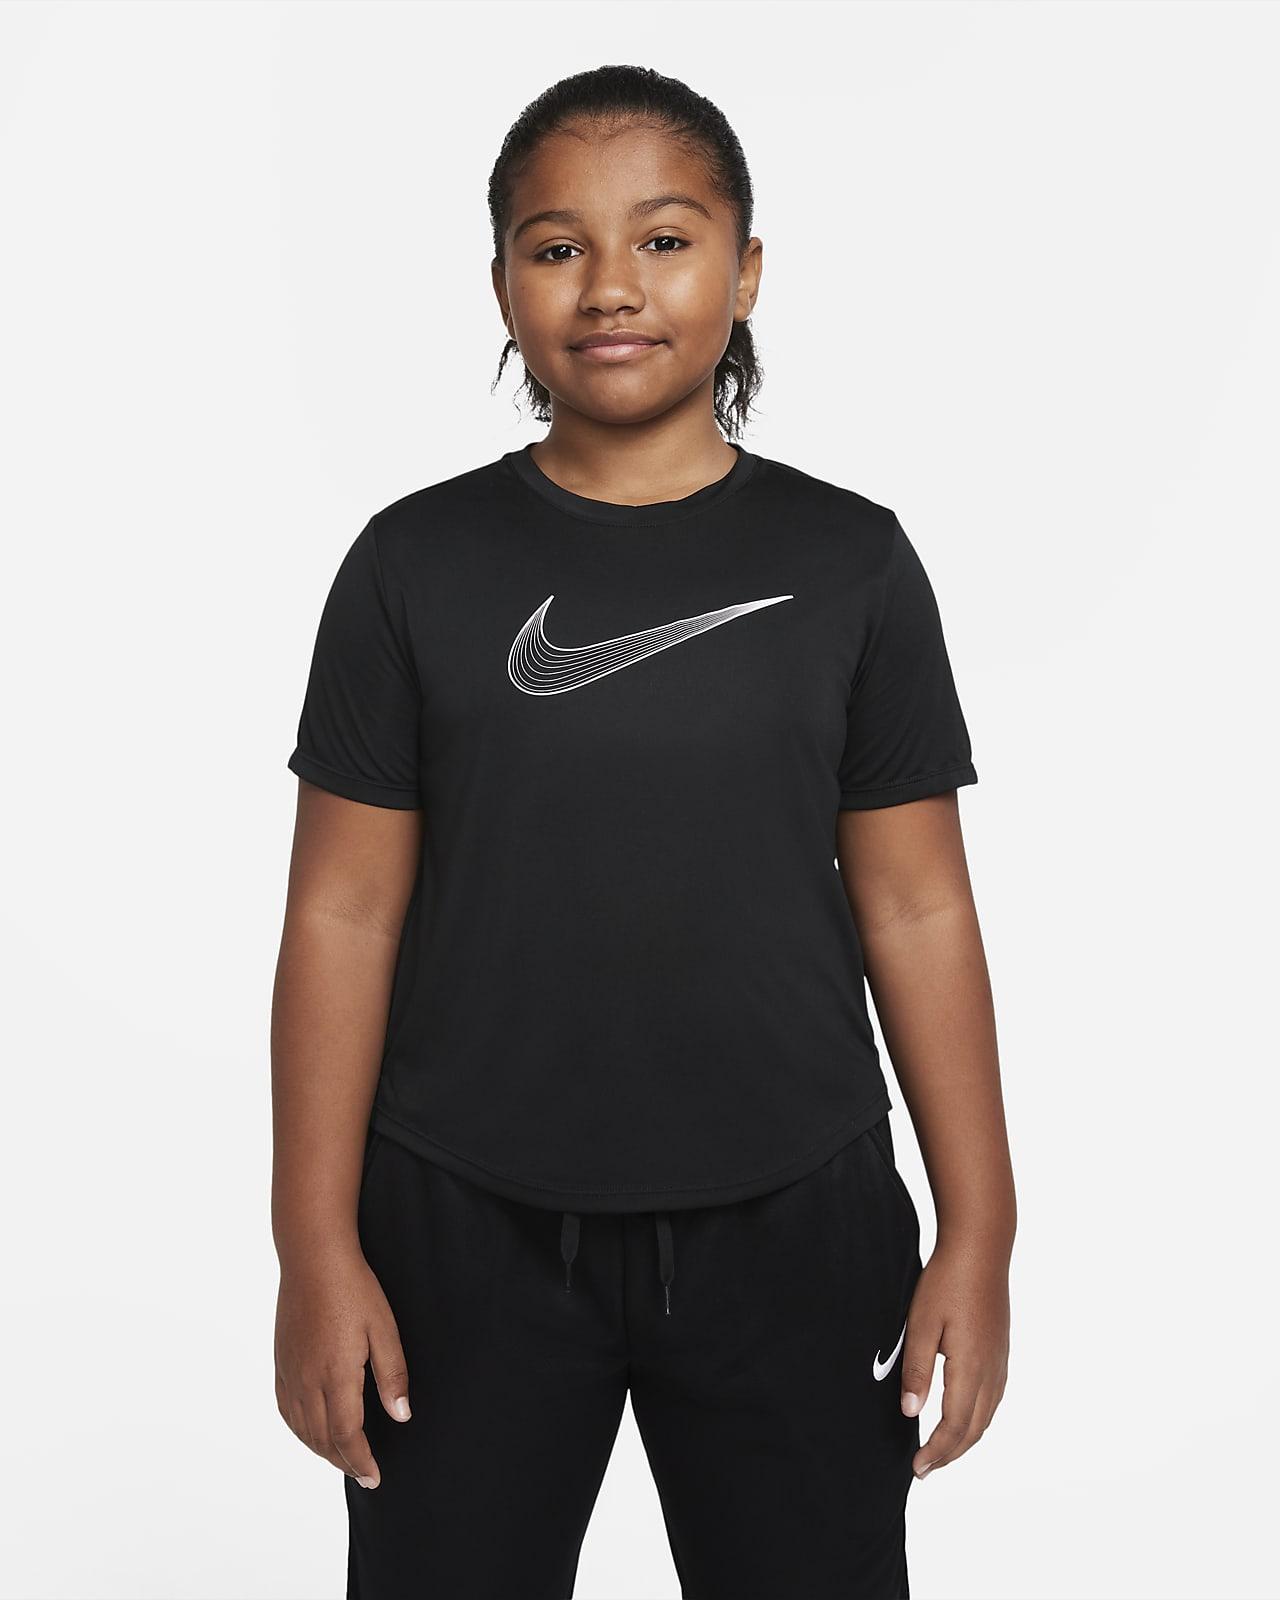 Playera de entrenamiento de manga corta Nike Dri-FIT One para niña talla grande (talla extendida)